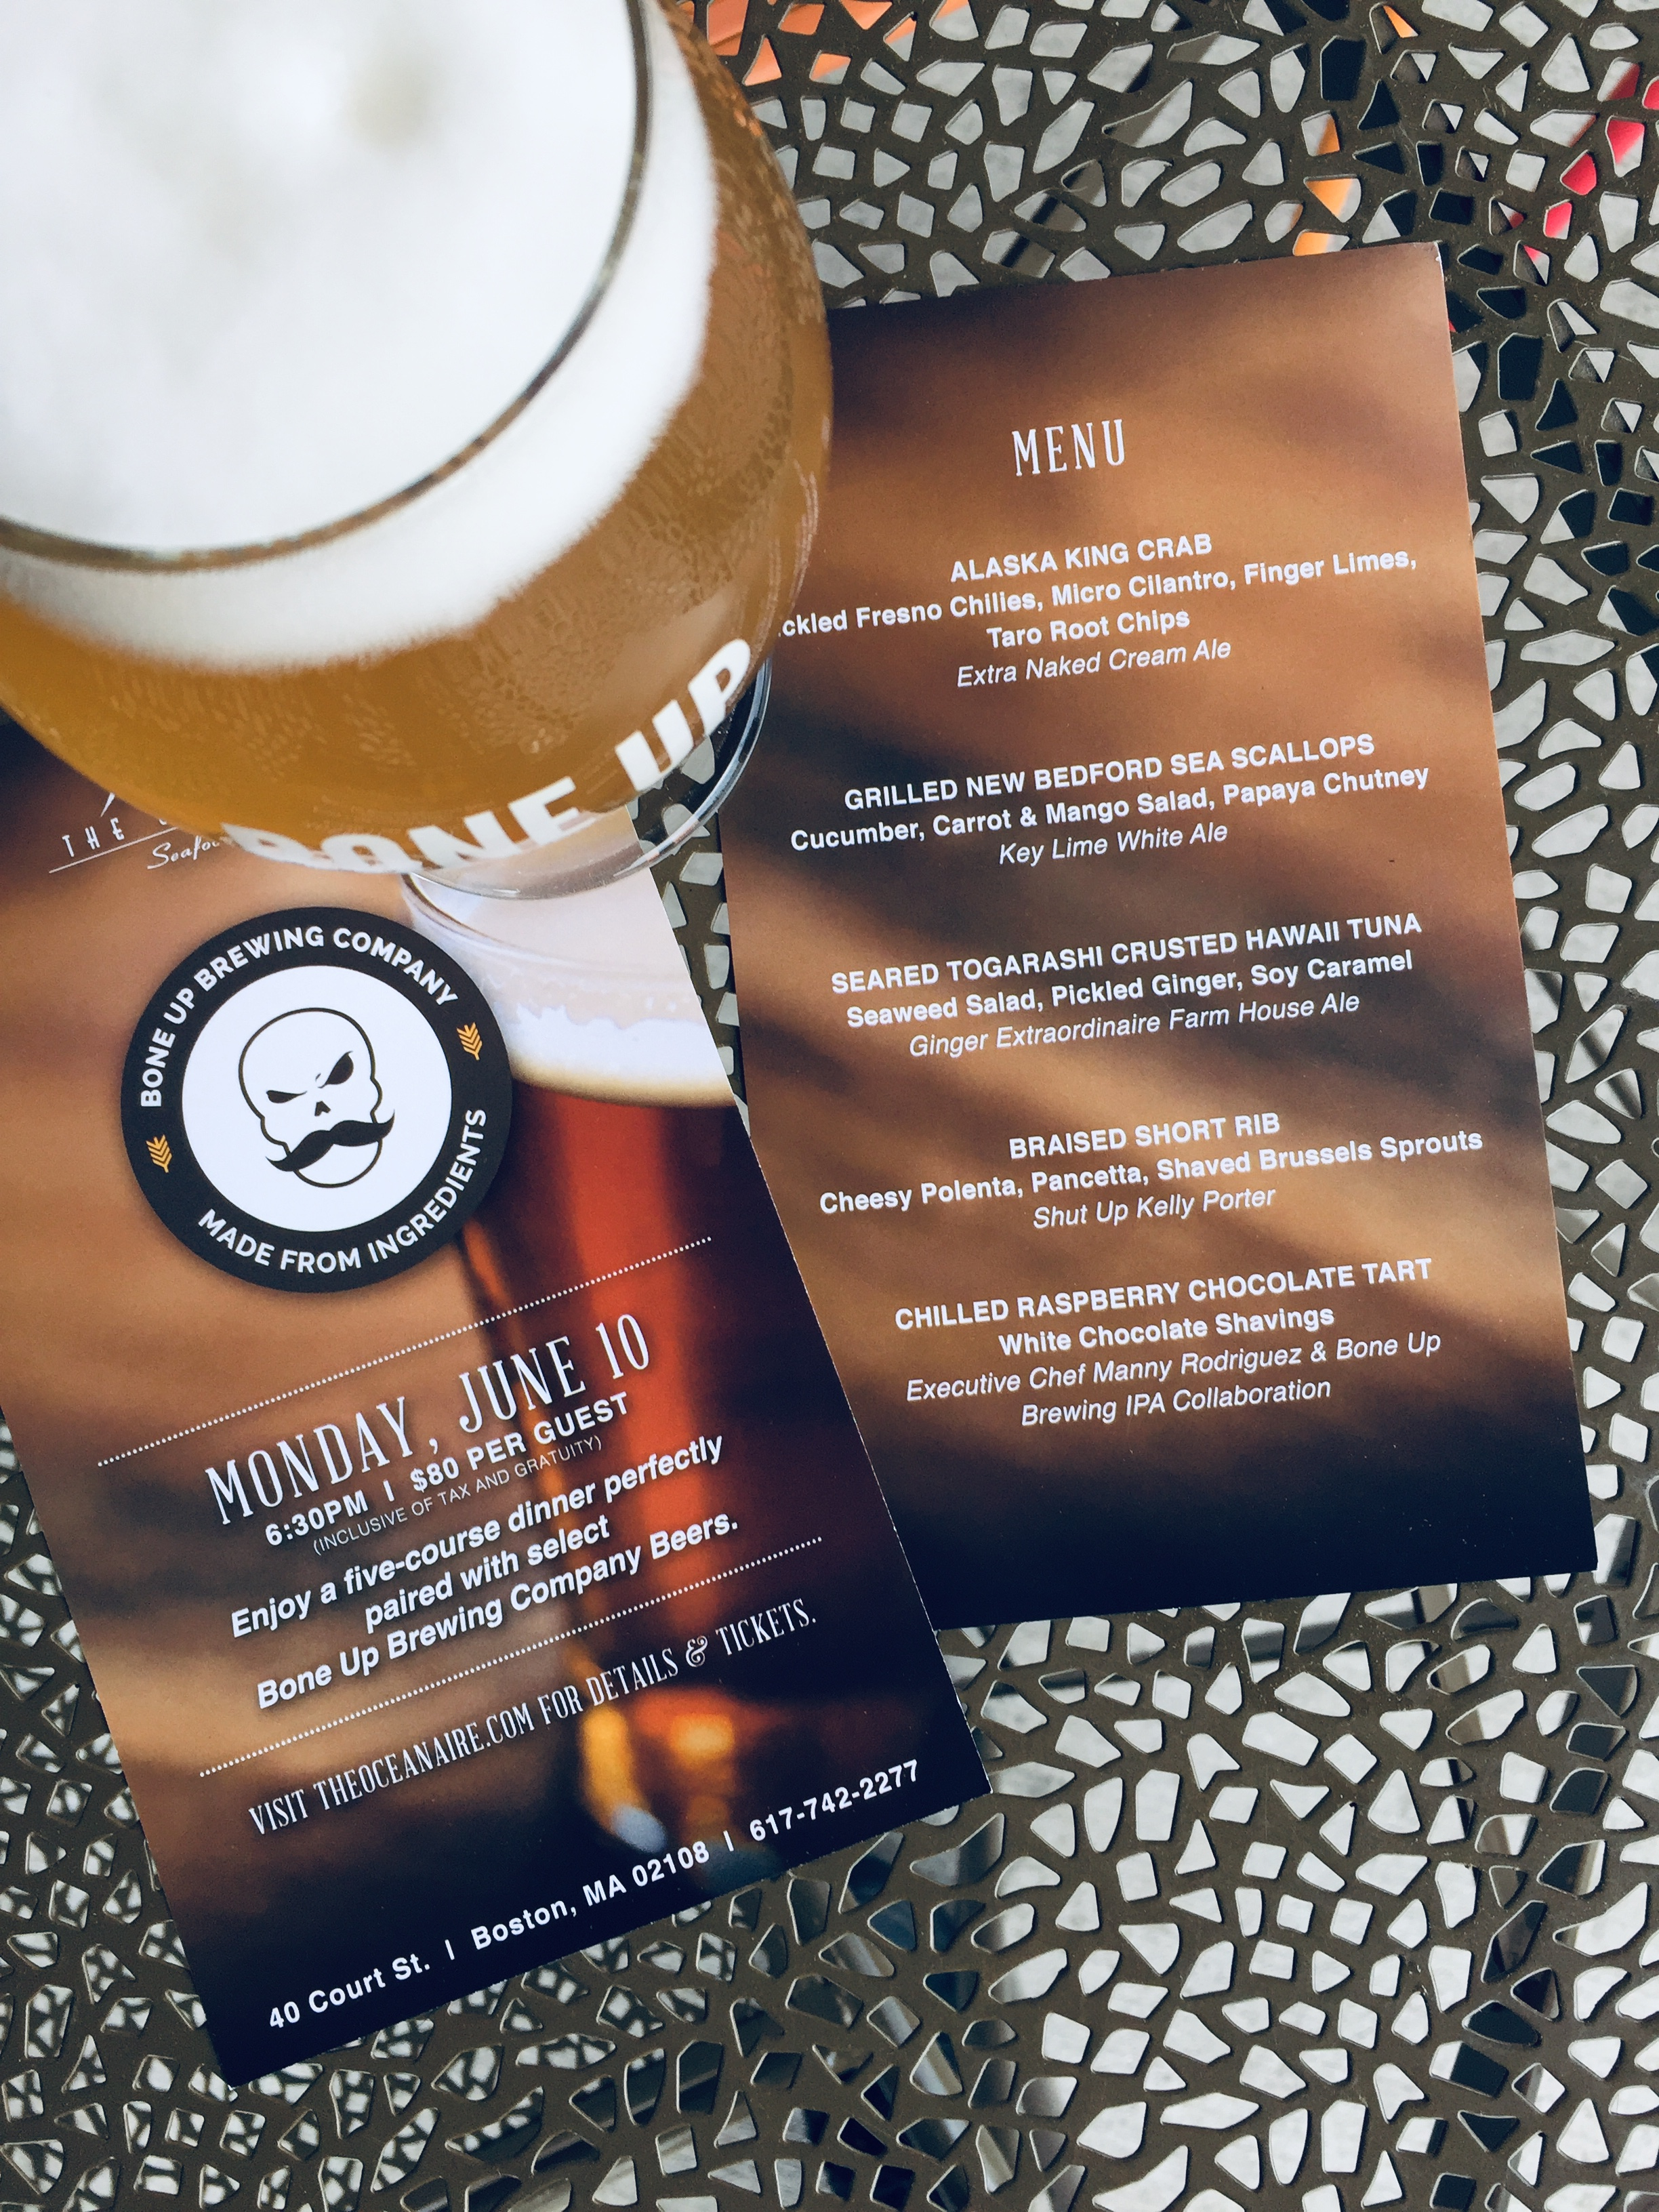 Bone Up Brewing Beer Dinner @ The Oceanaire [06/10/19]